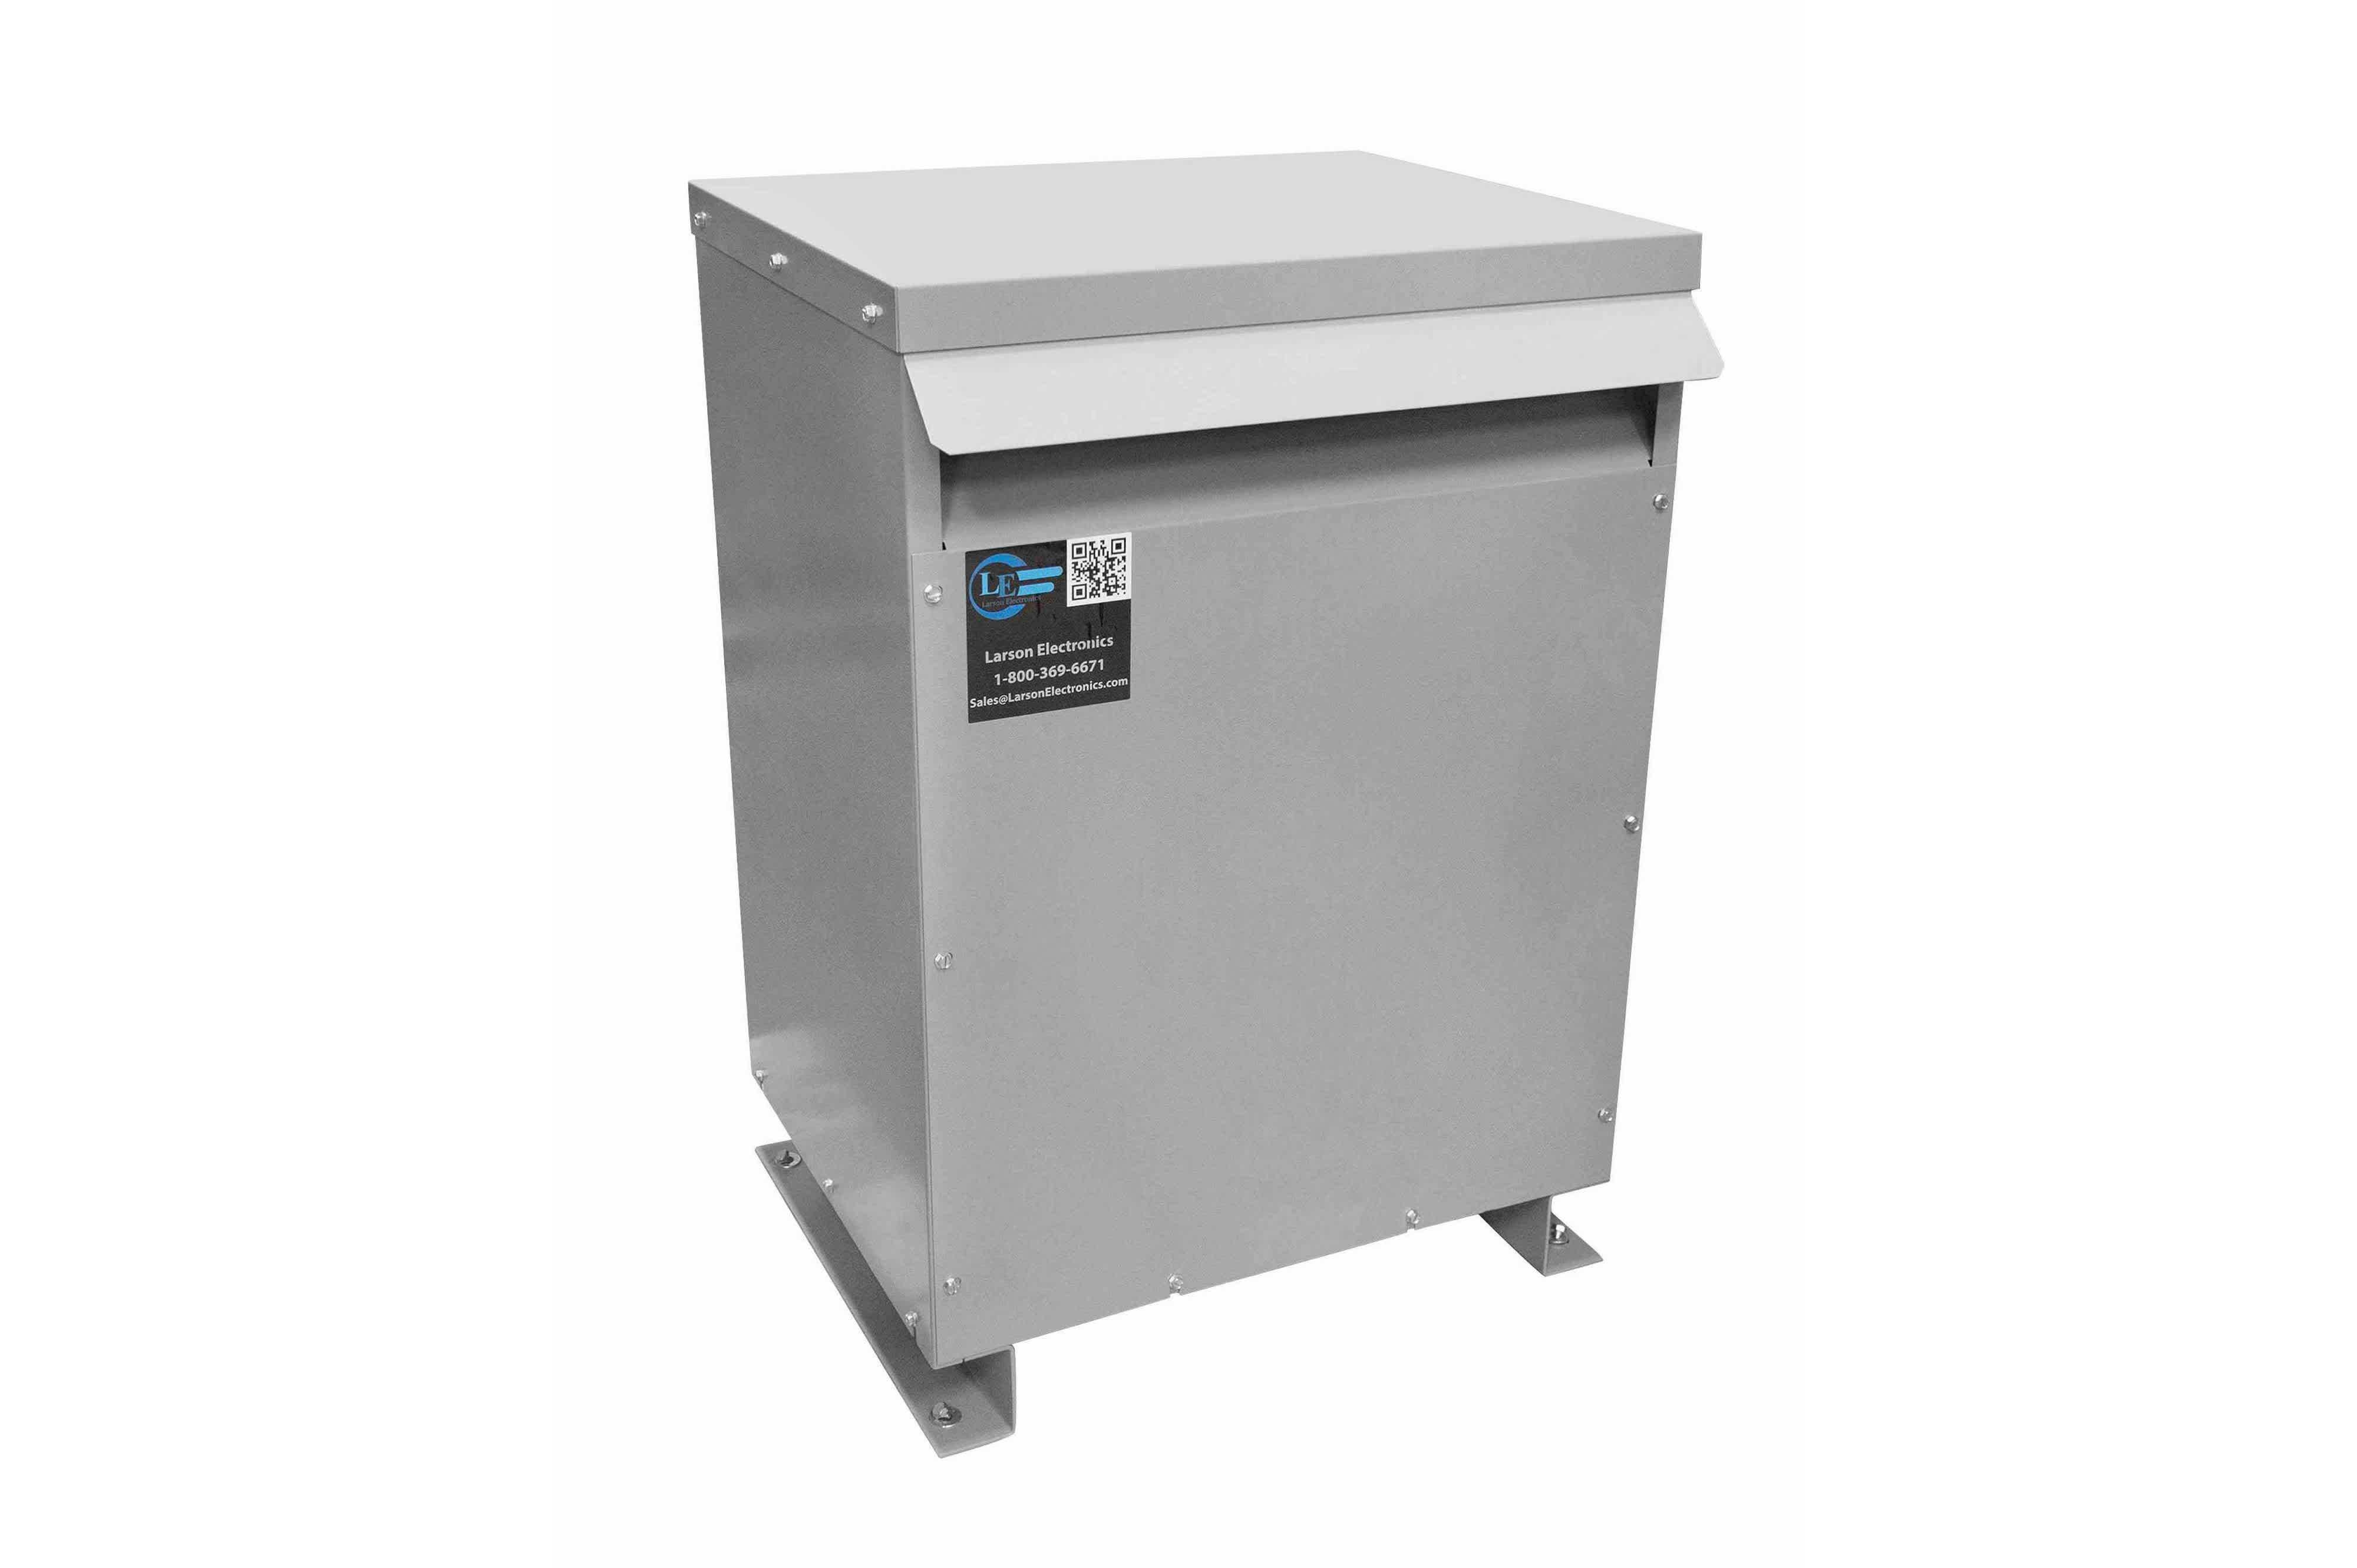 125 kVA 3PH Isolation Transformer, 240V Wye Primary, 208Y/120 Wye-N Secondary, N3R, Ventilated, 60 Hz